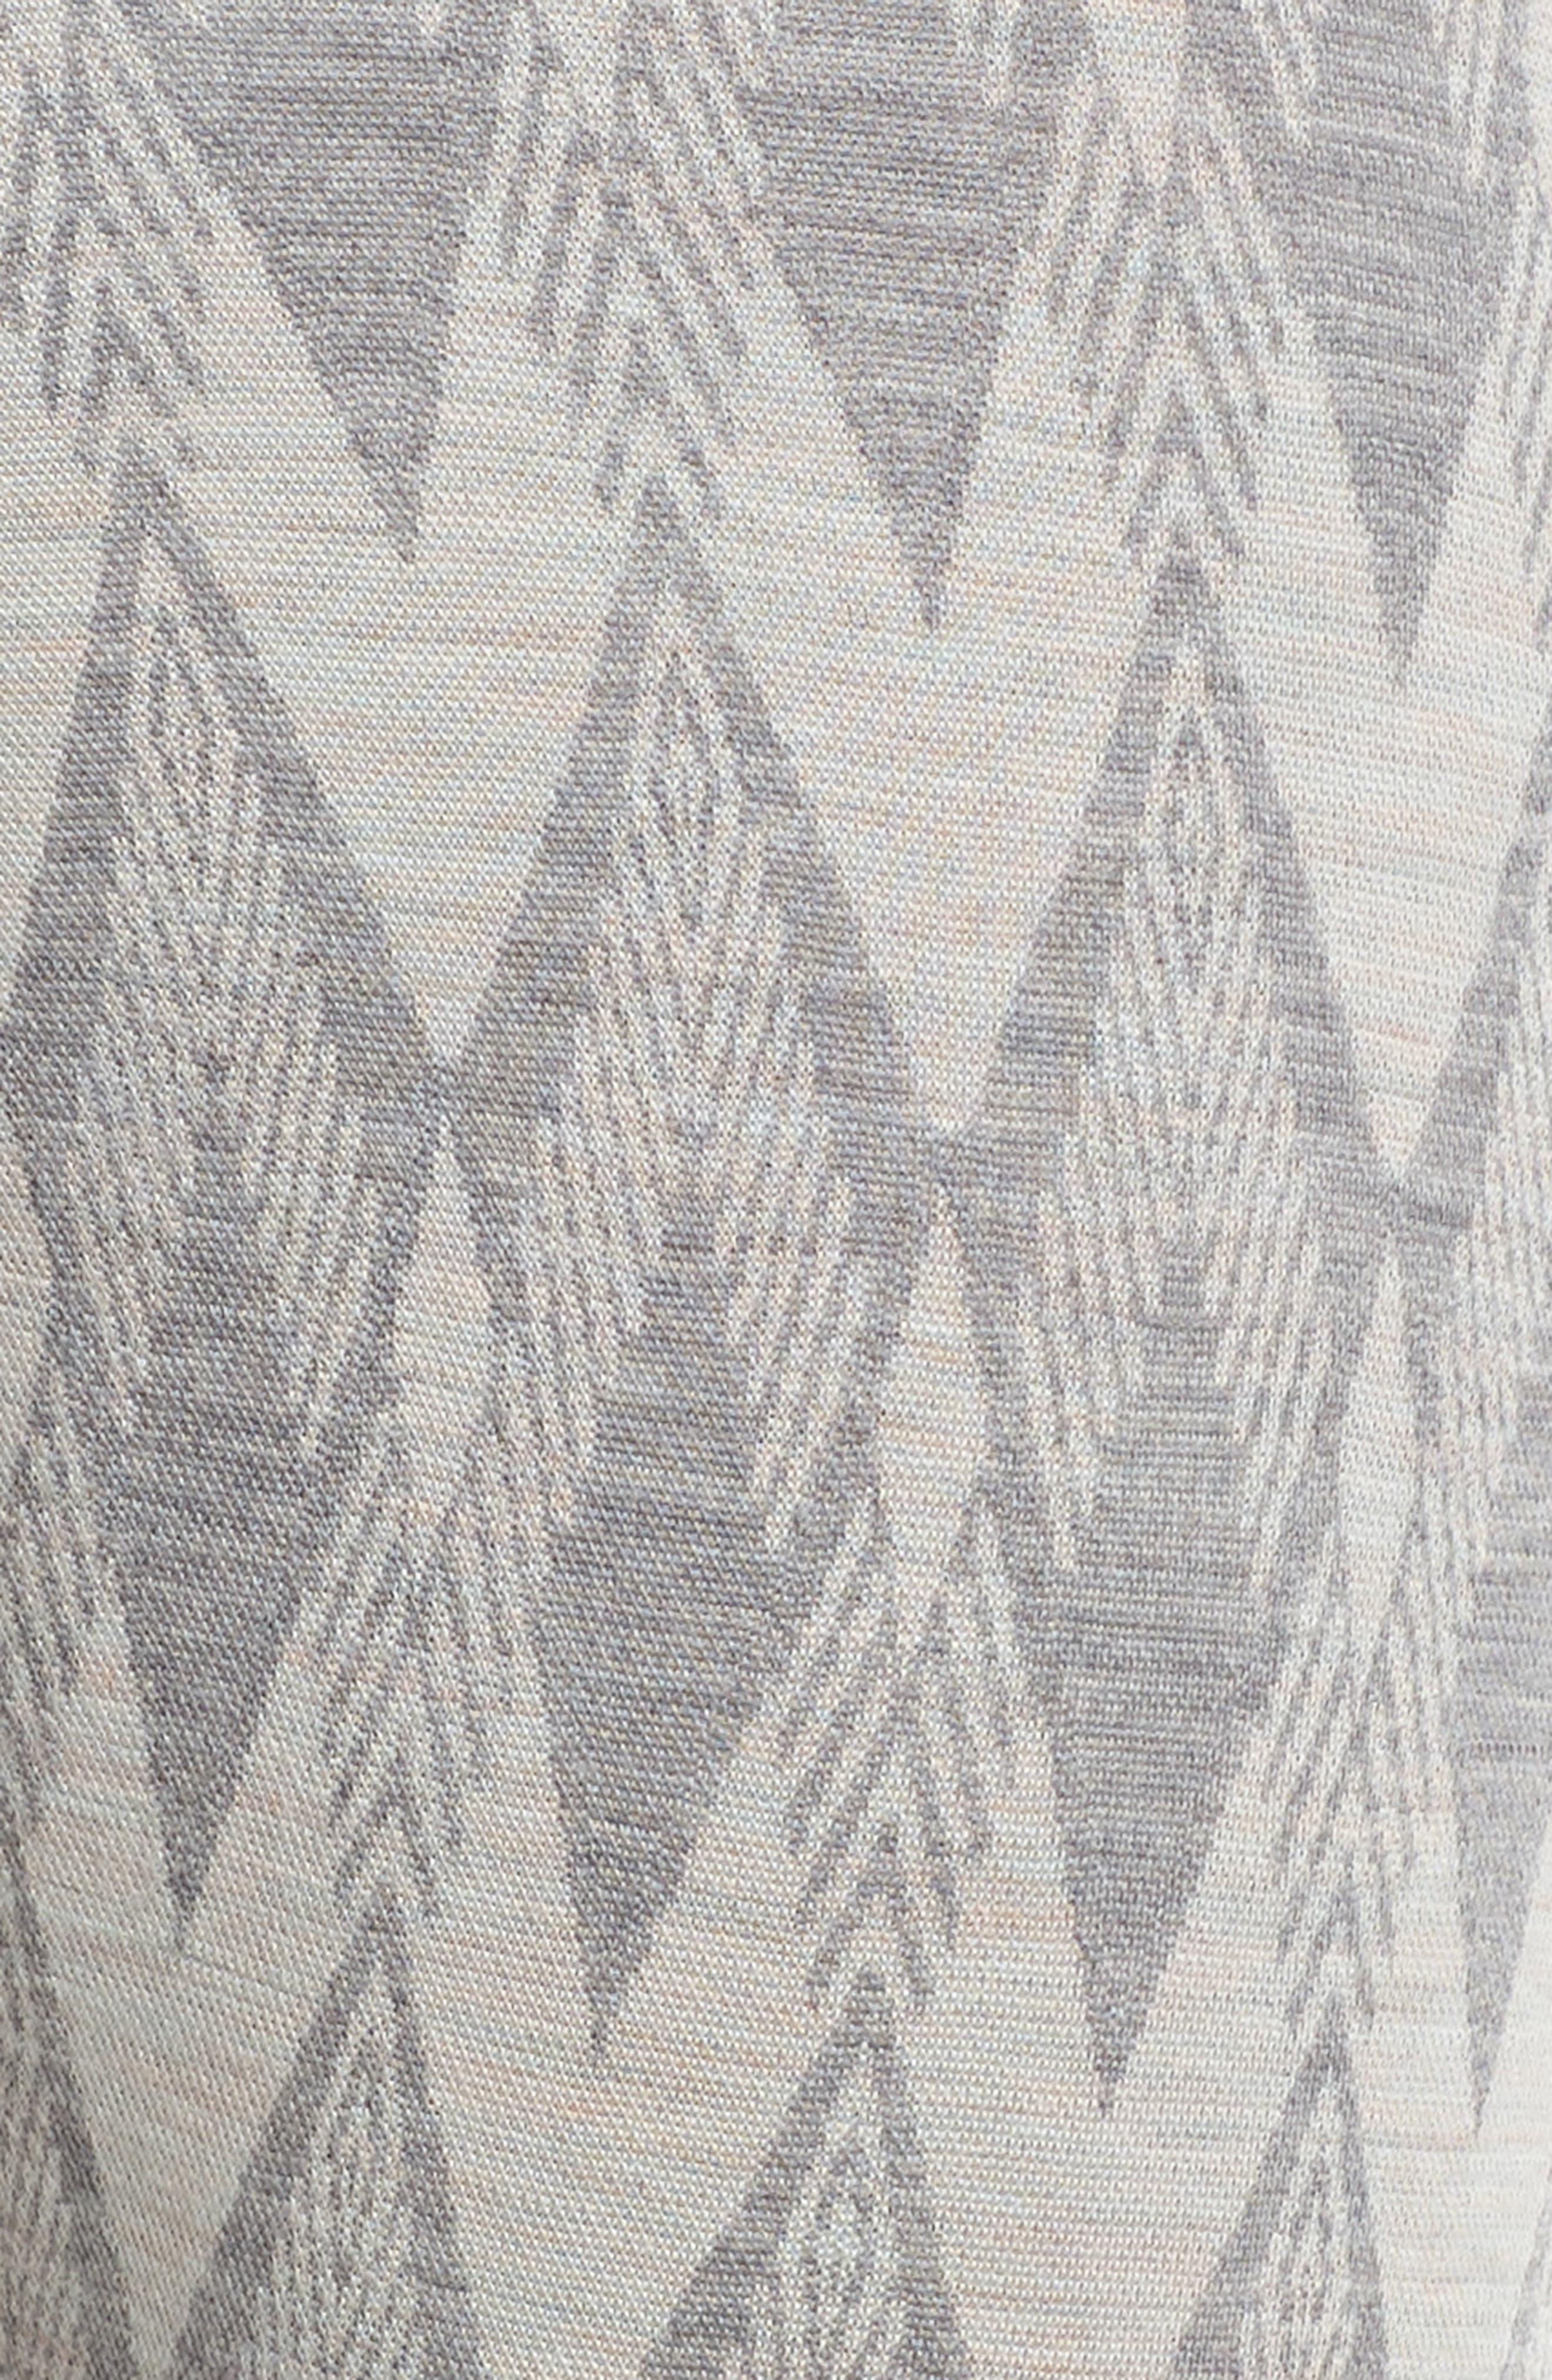 Merino 250 Base Layer Pattern Bottoms,                             Alternate thumbnail 6, color,                             050